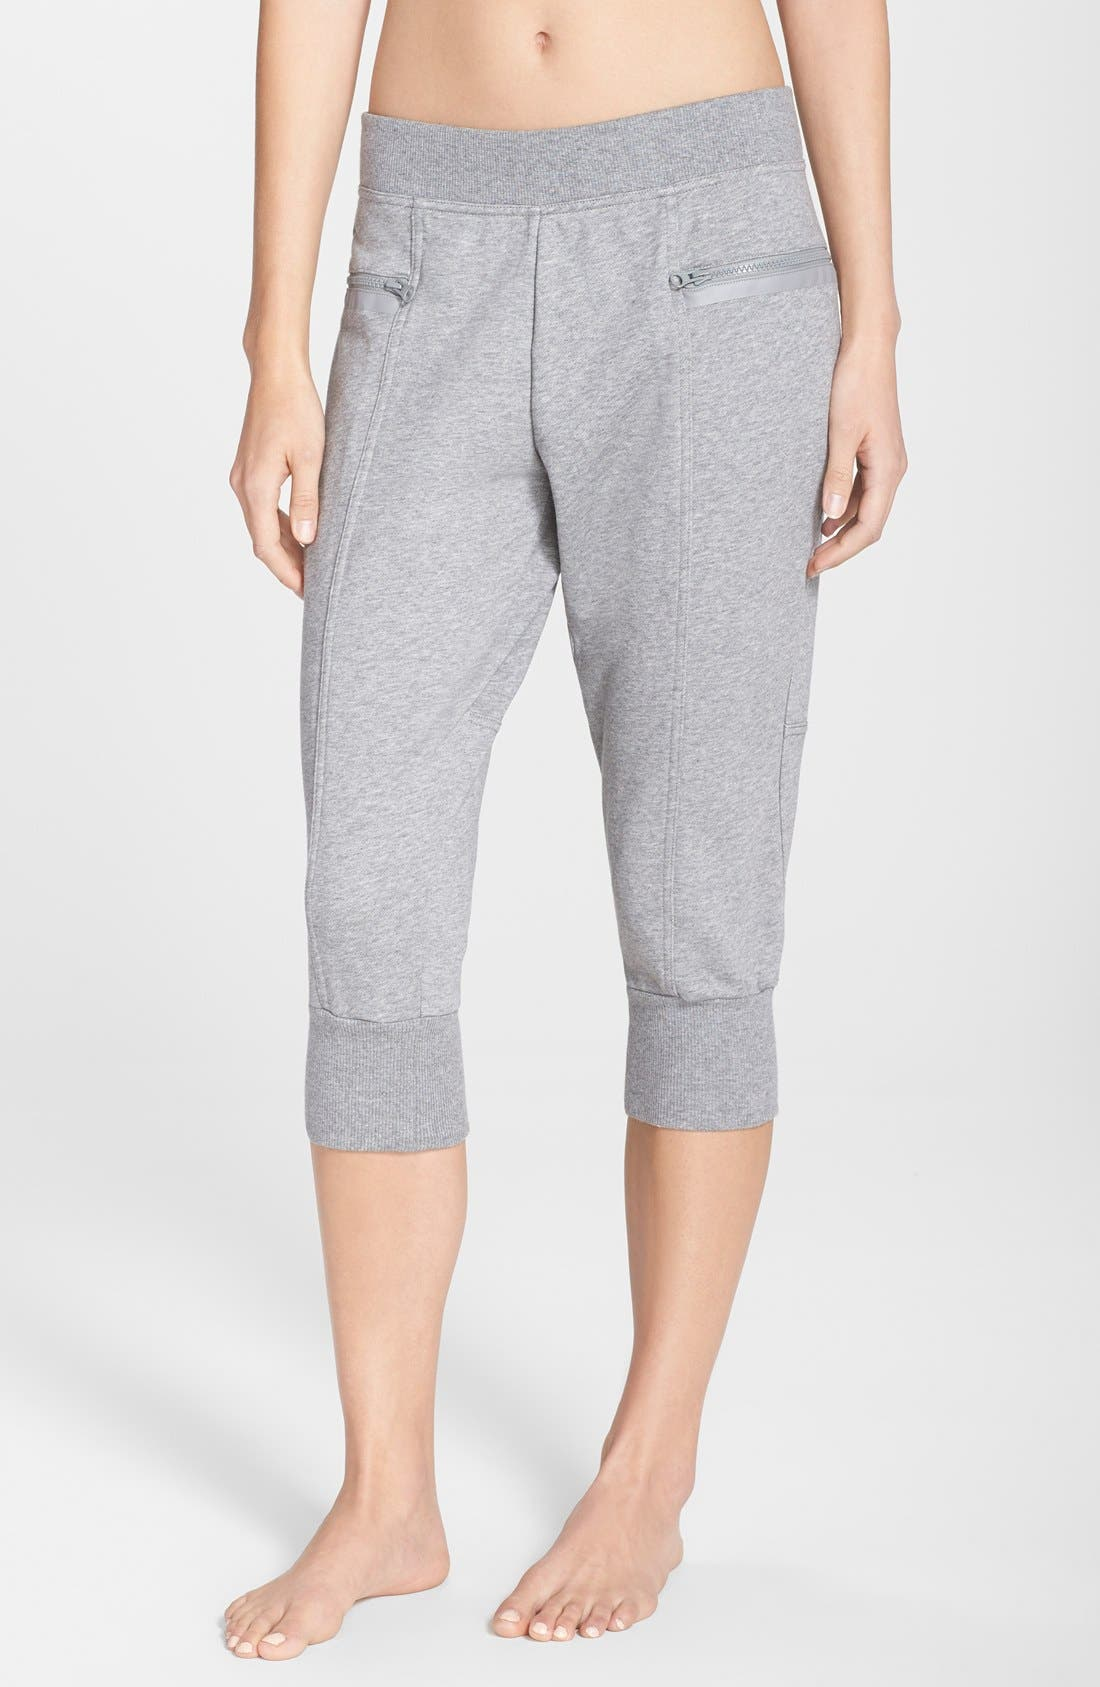 Alternate Image 1 Selected - adidas by Stella McCartney 'Ess' Organic Cotton Sweatpants